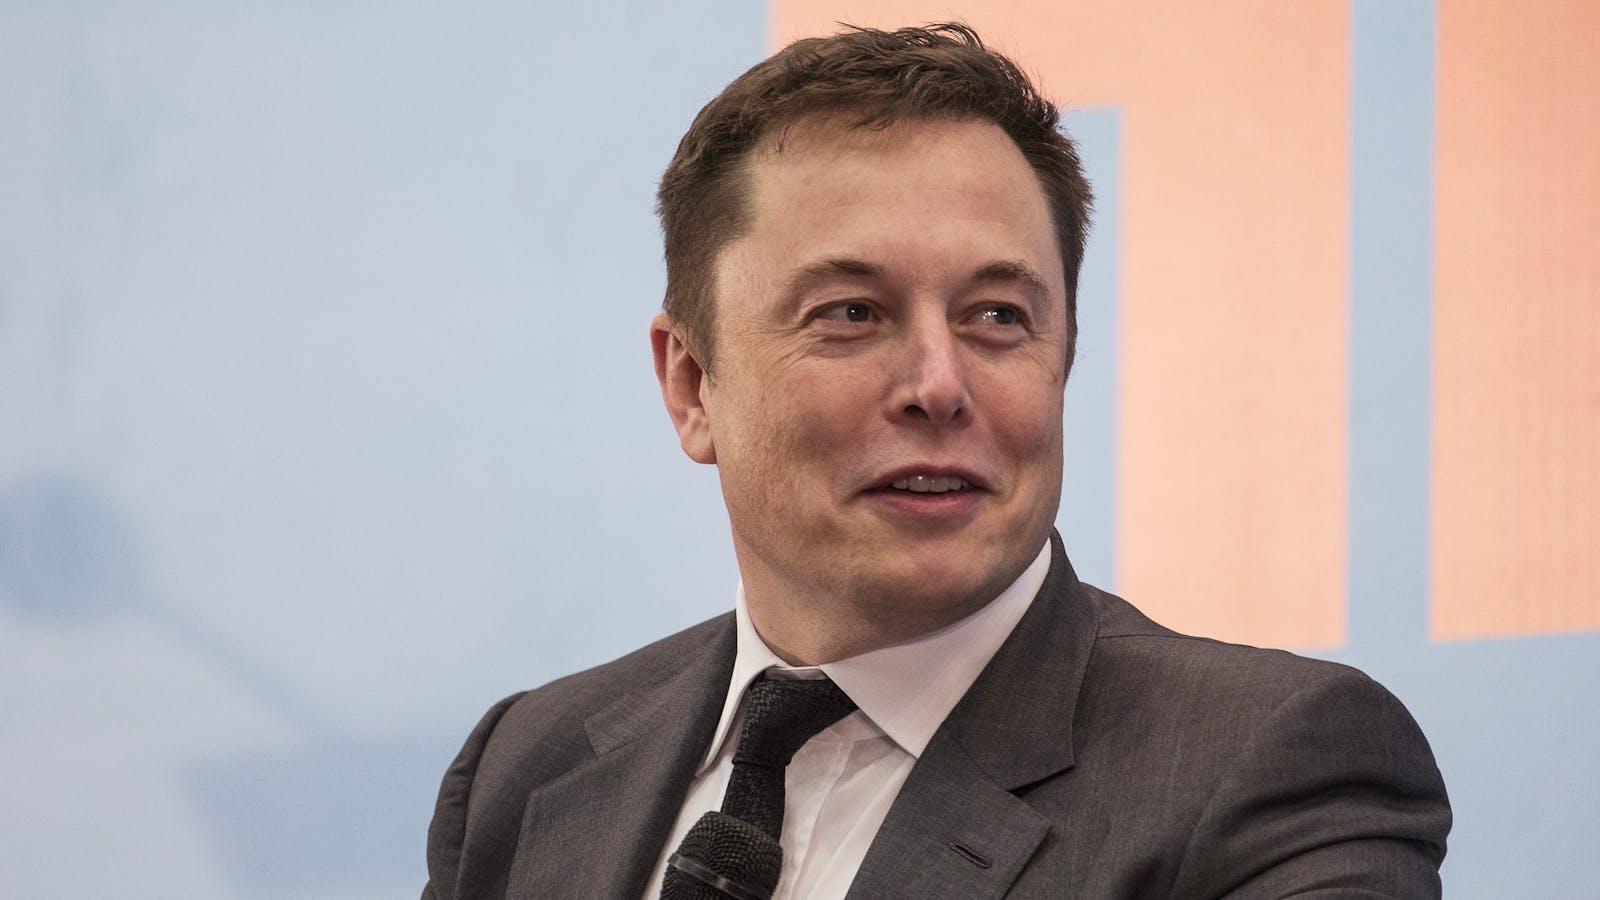 Elon Musk. Photo by Bloomberg.